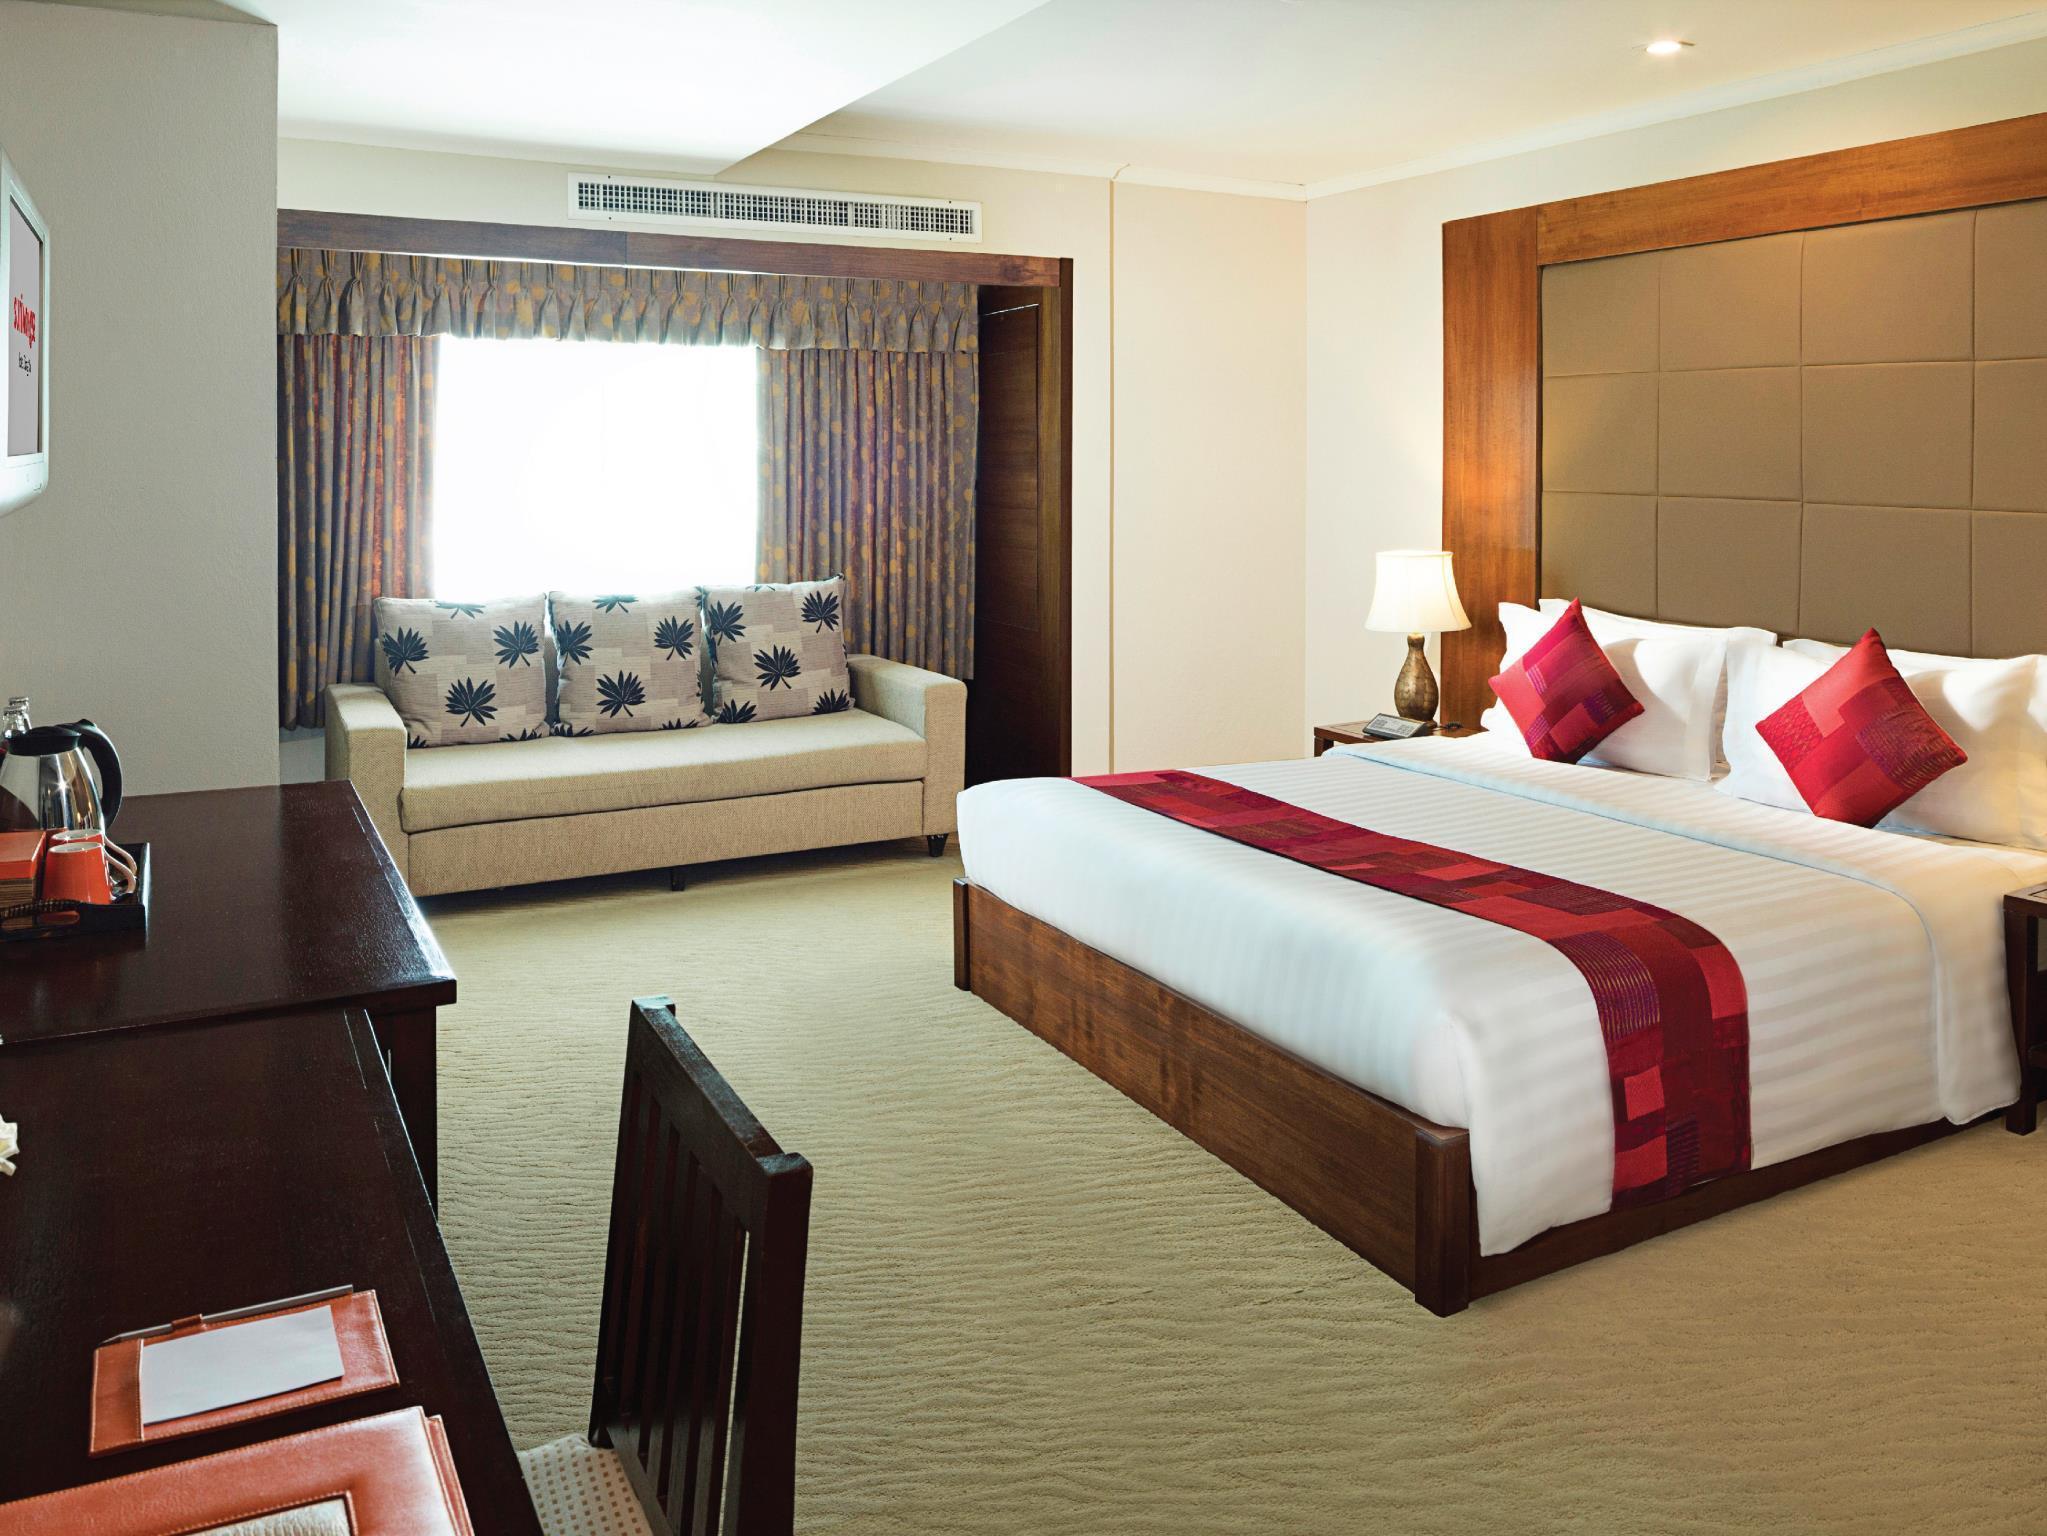 Movenpick Suriwongse Hotel โมเวนพิค สุริวงศ์ โฮเทล